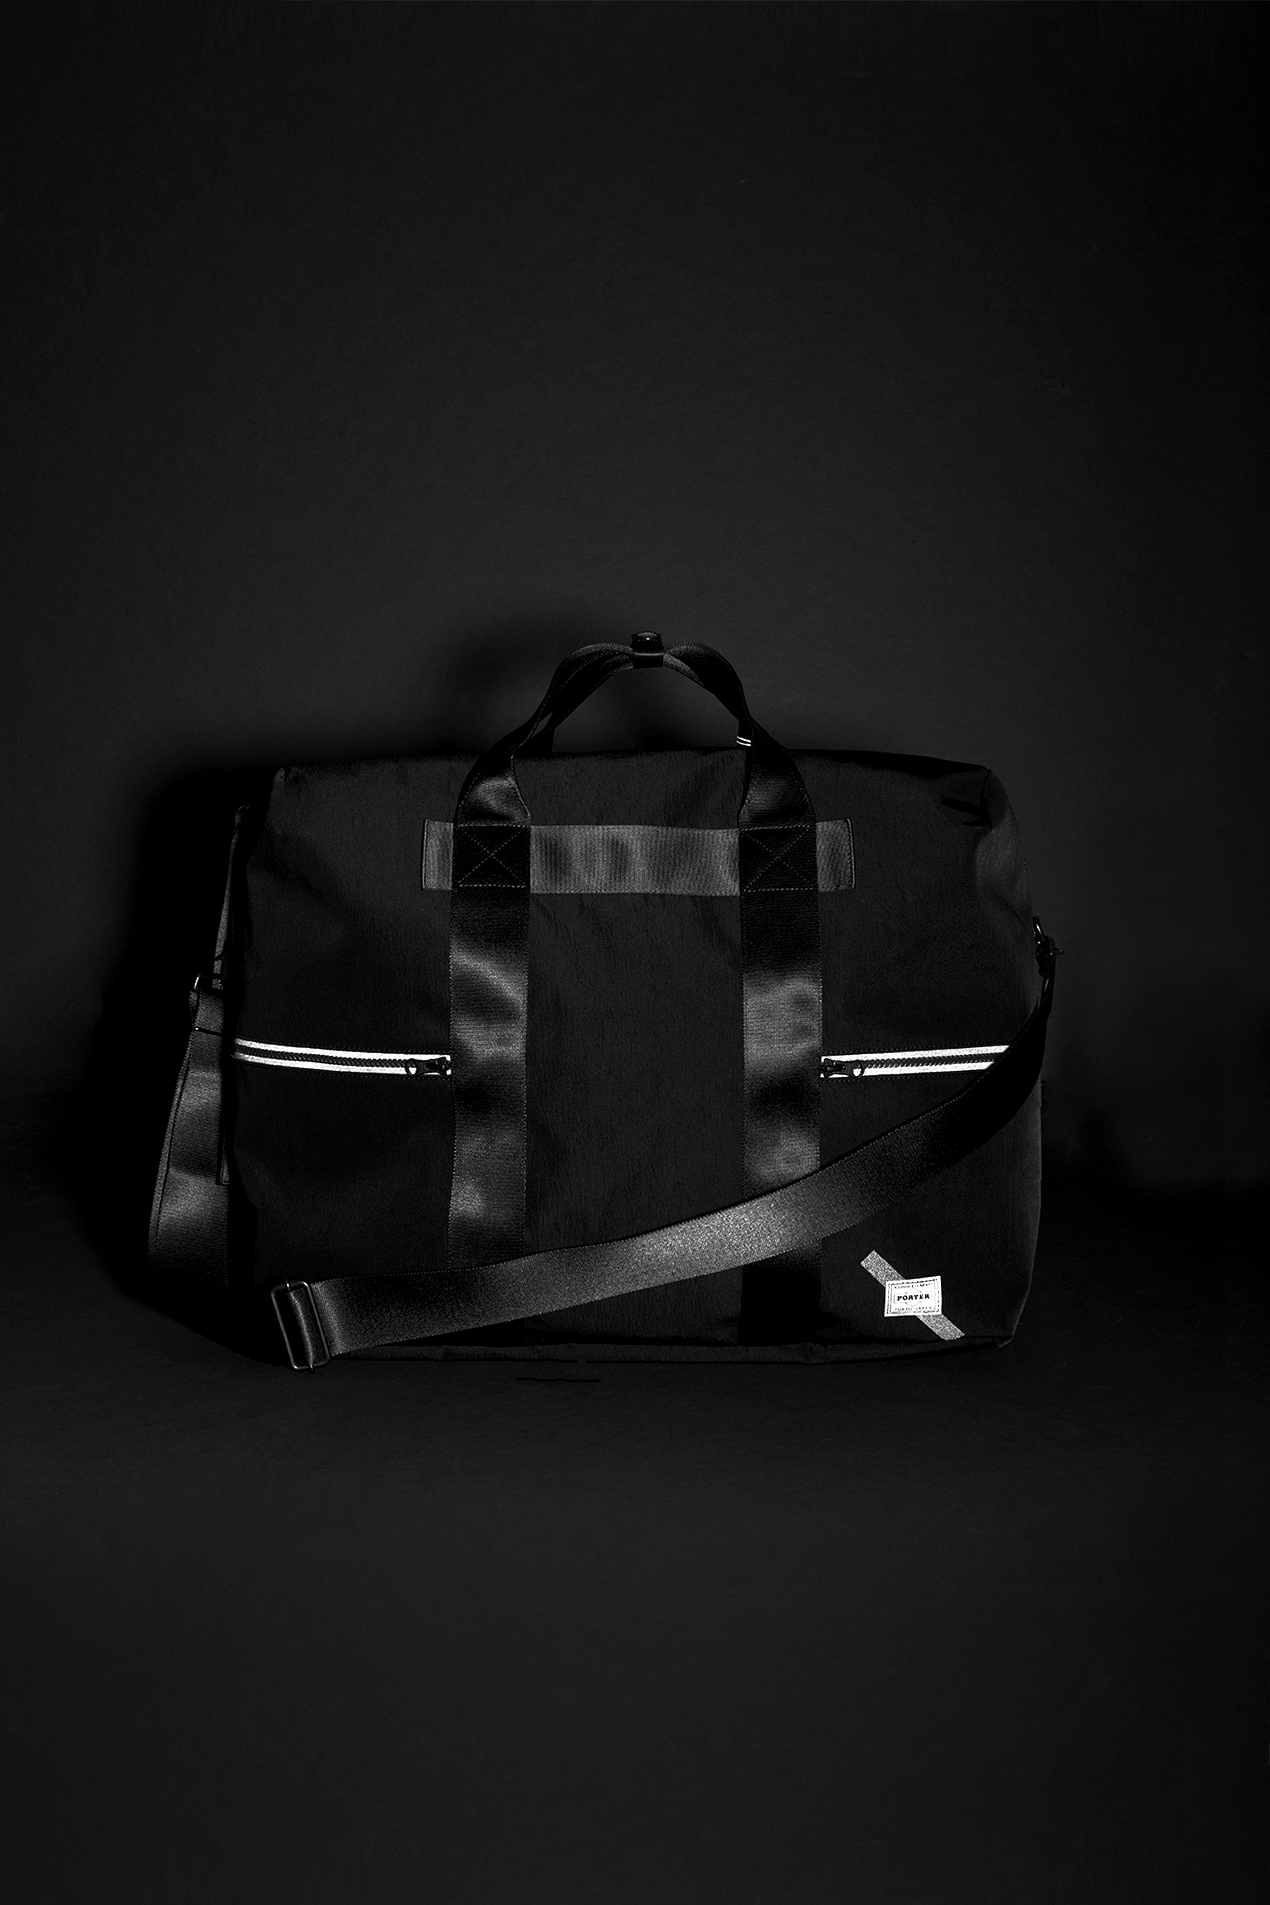 Reflective Weekender Duffle Bag